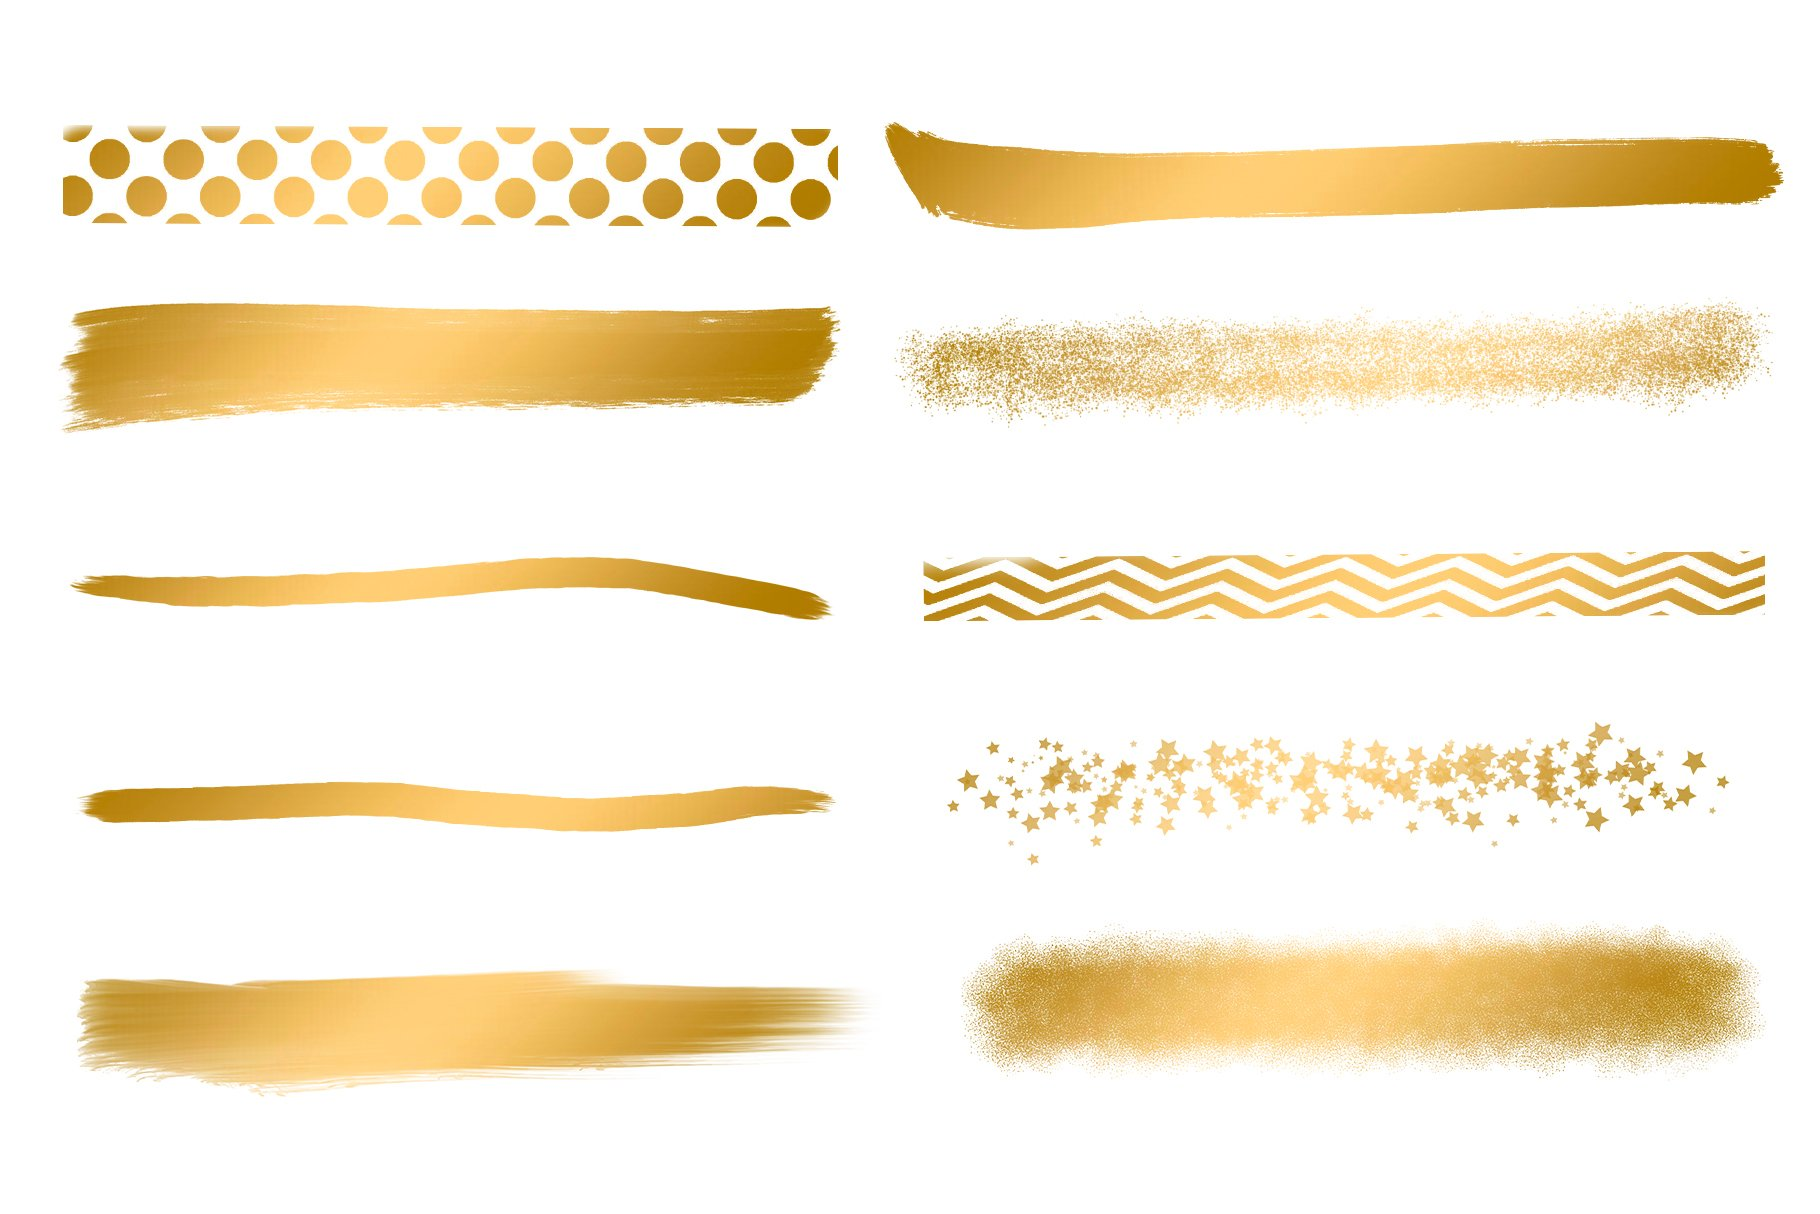 Gold Brush Strokes, Brush Strokes example image 2